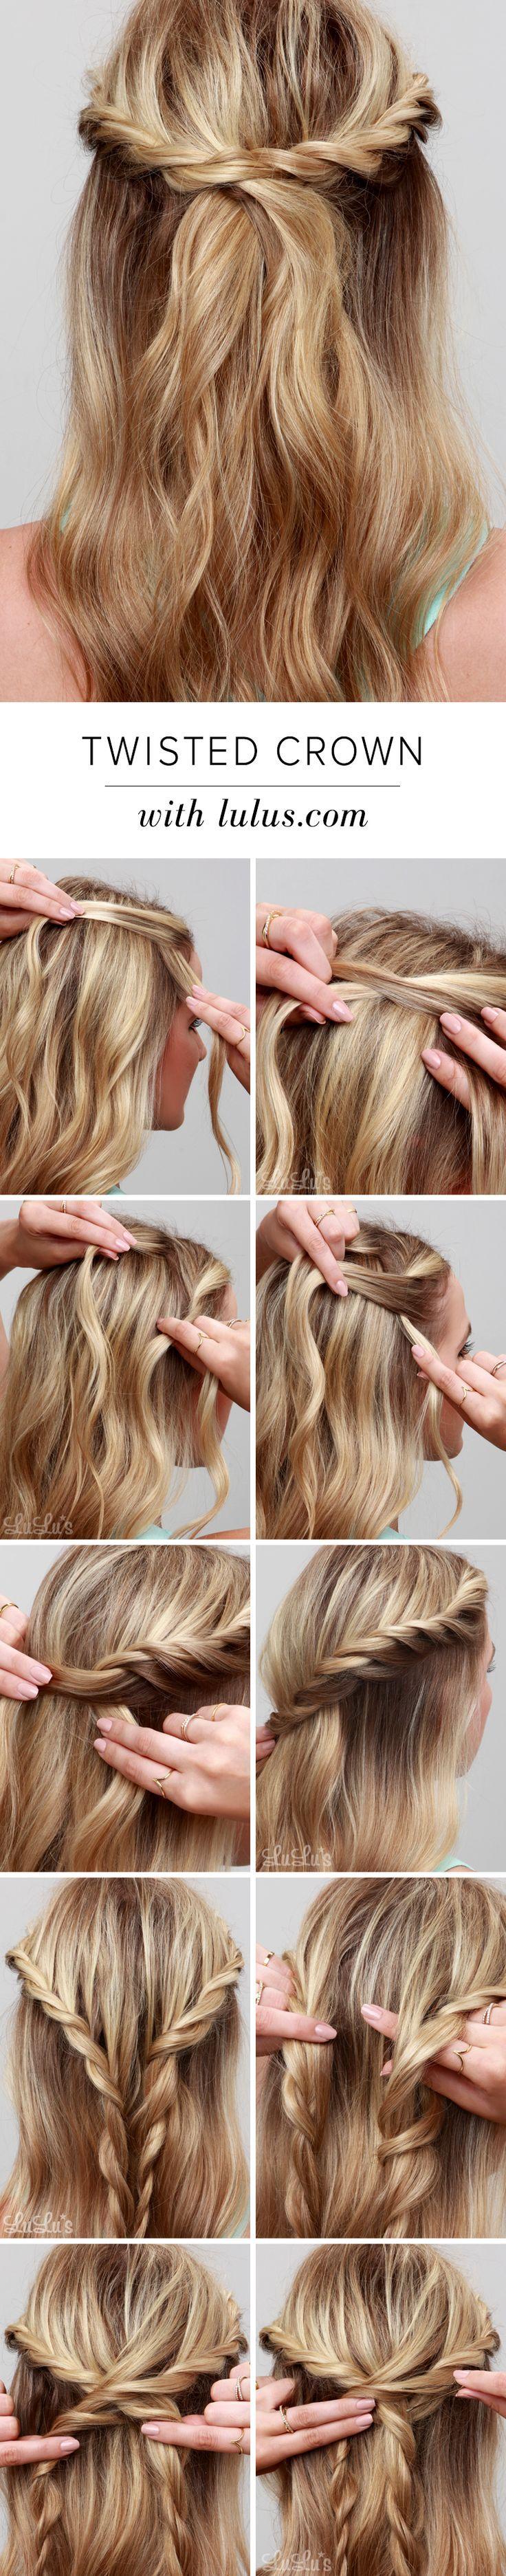 189 best ♪ Hair Tutorials♪ images on Pinterest